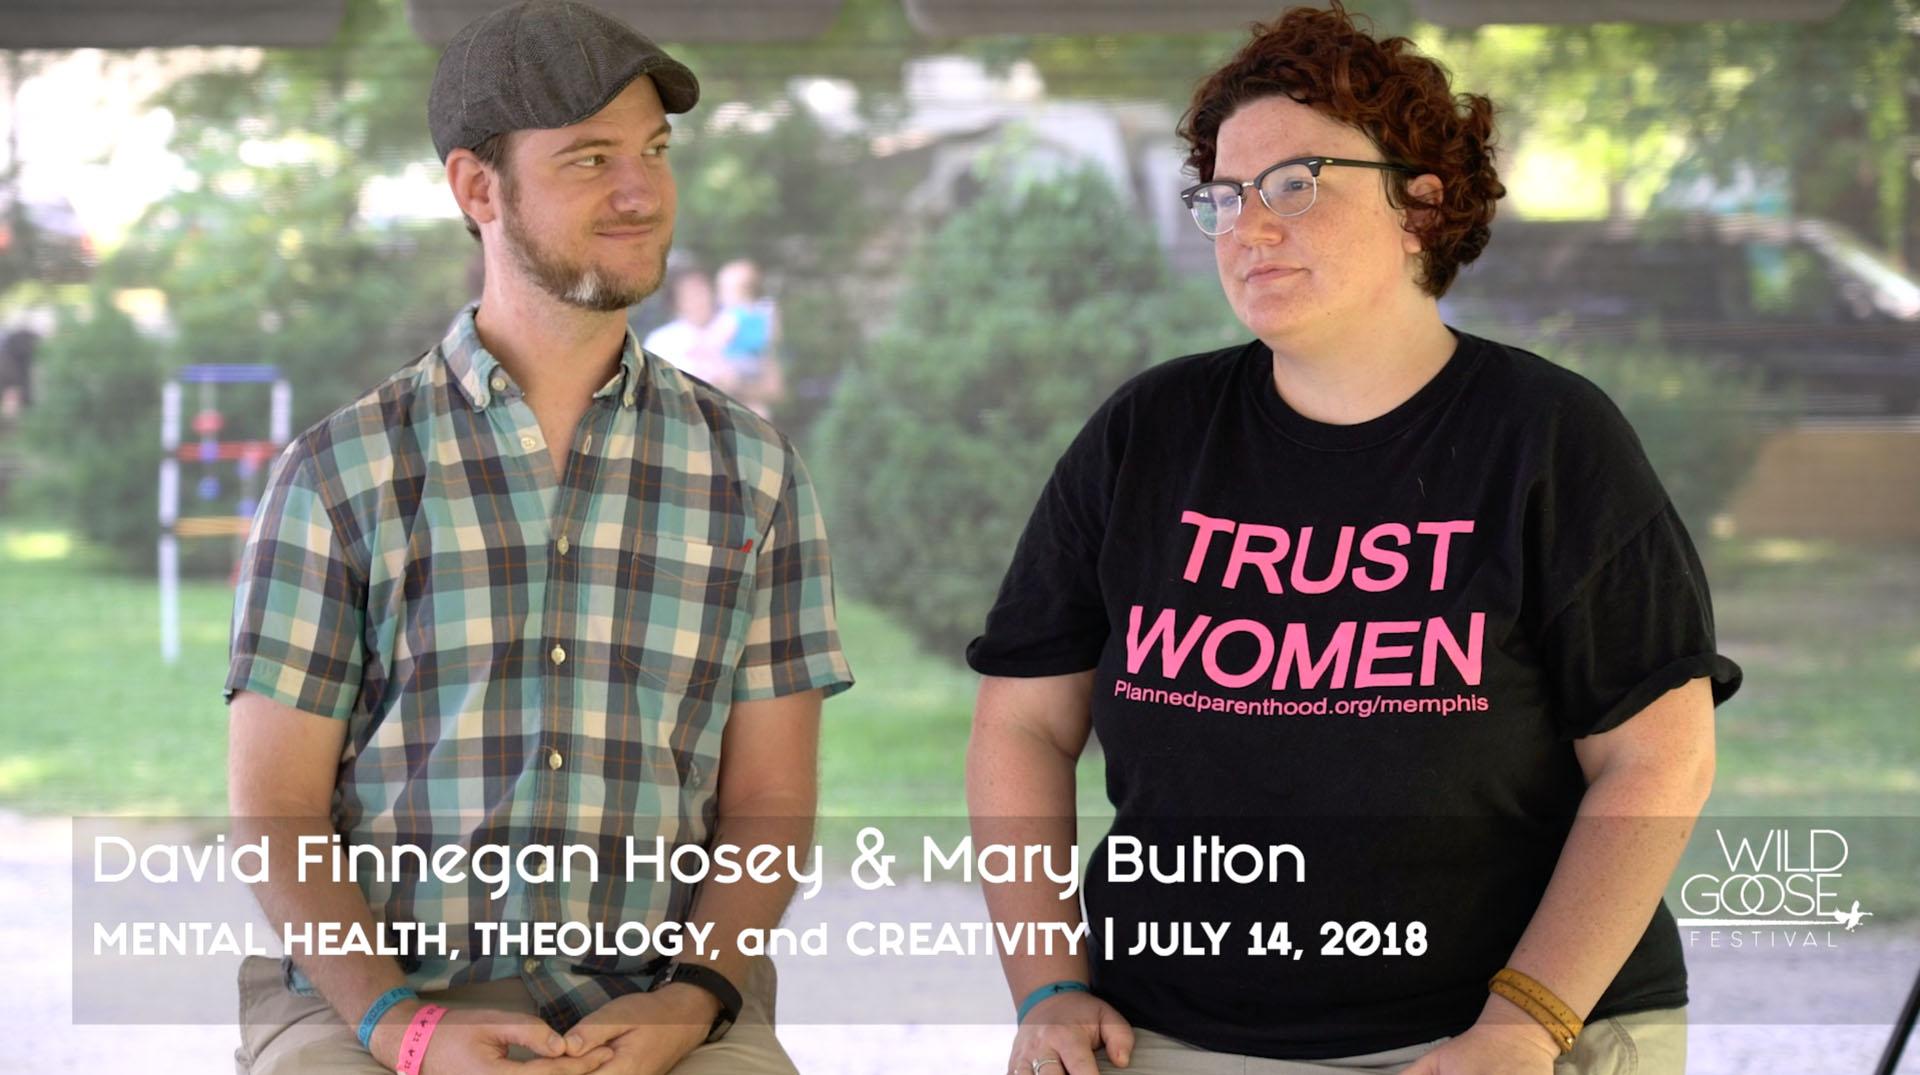 Mental Health, Theology, and Creativity - David Finnegan Hosey & Mary Button